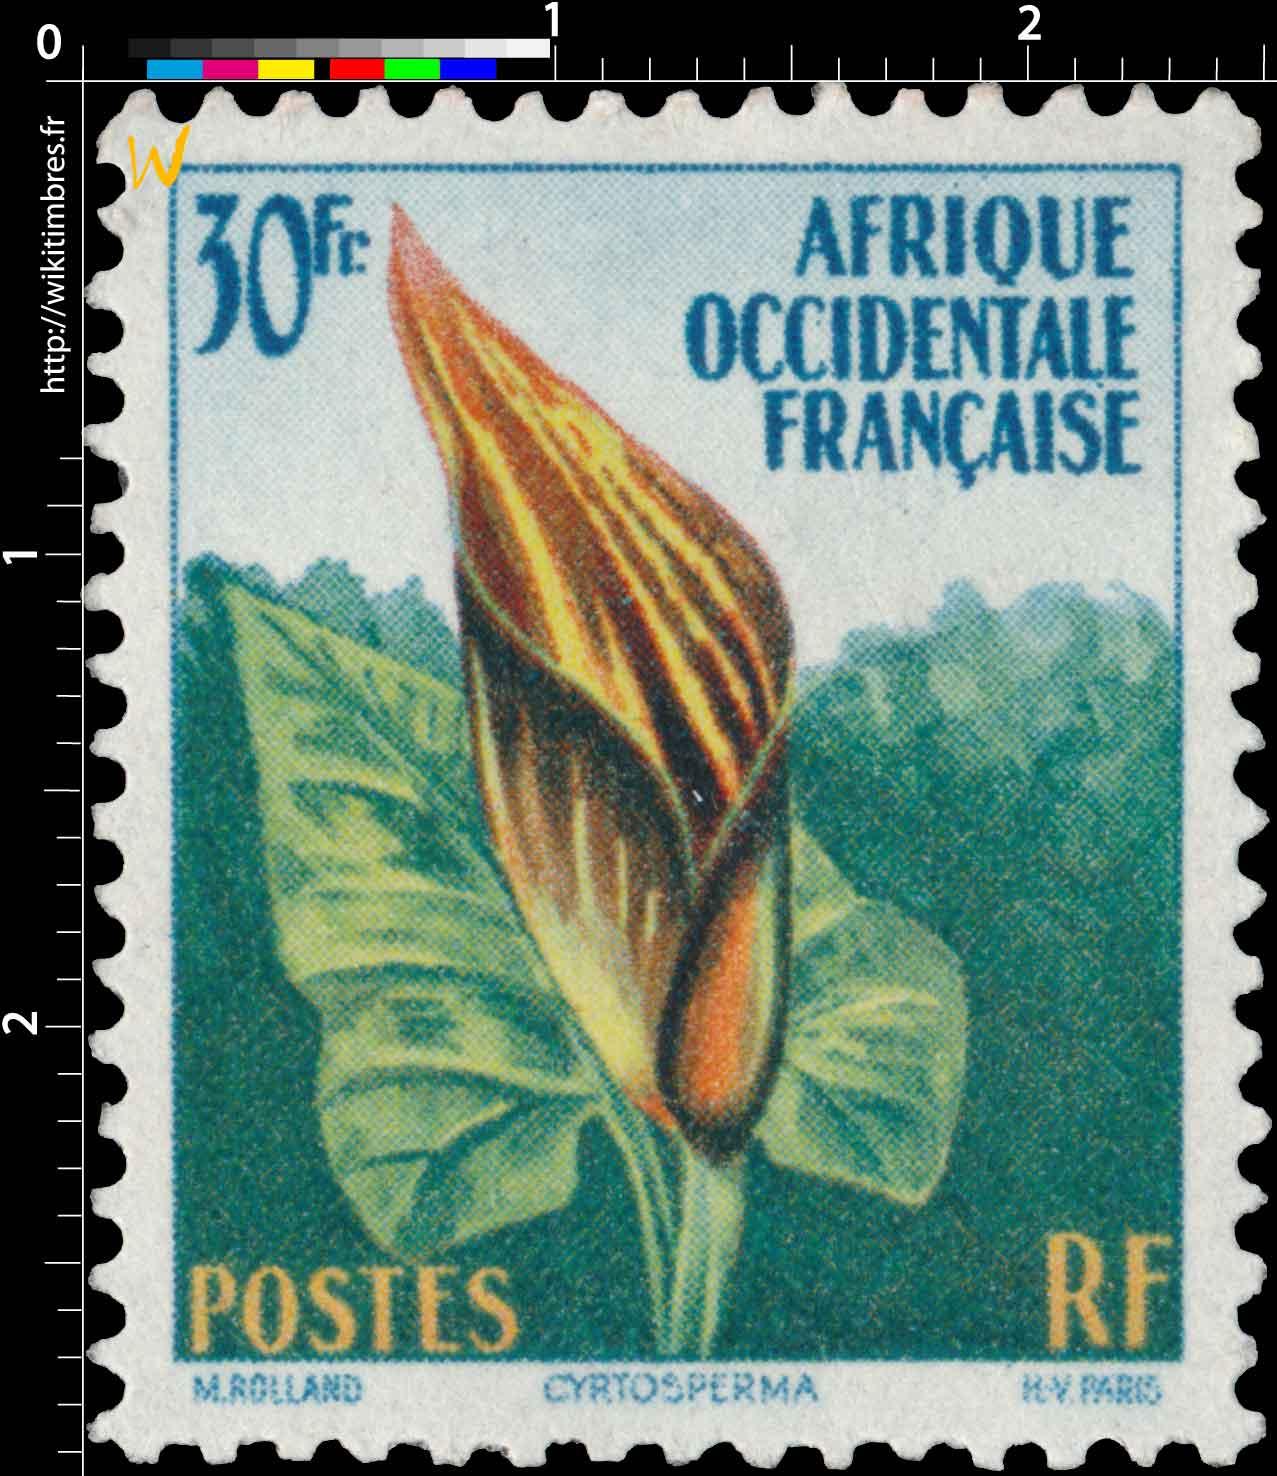 Afrique Occidentale Française - Cyrtosperma